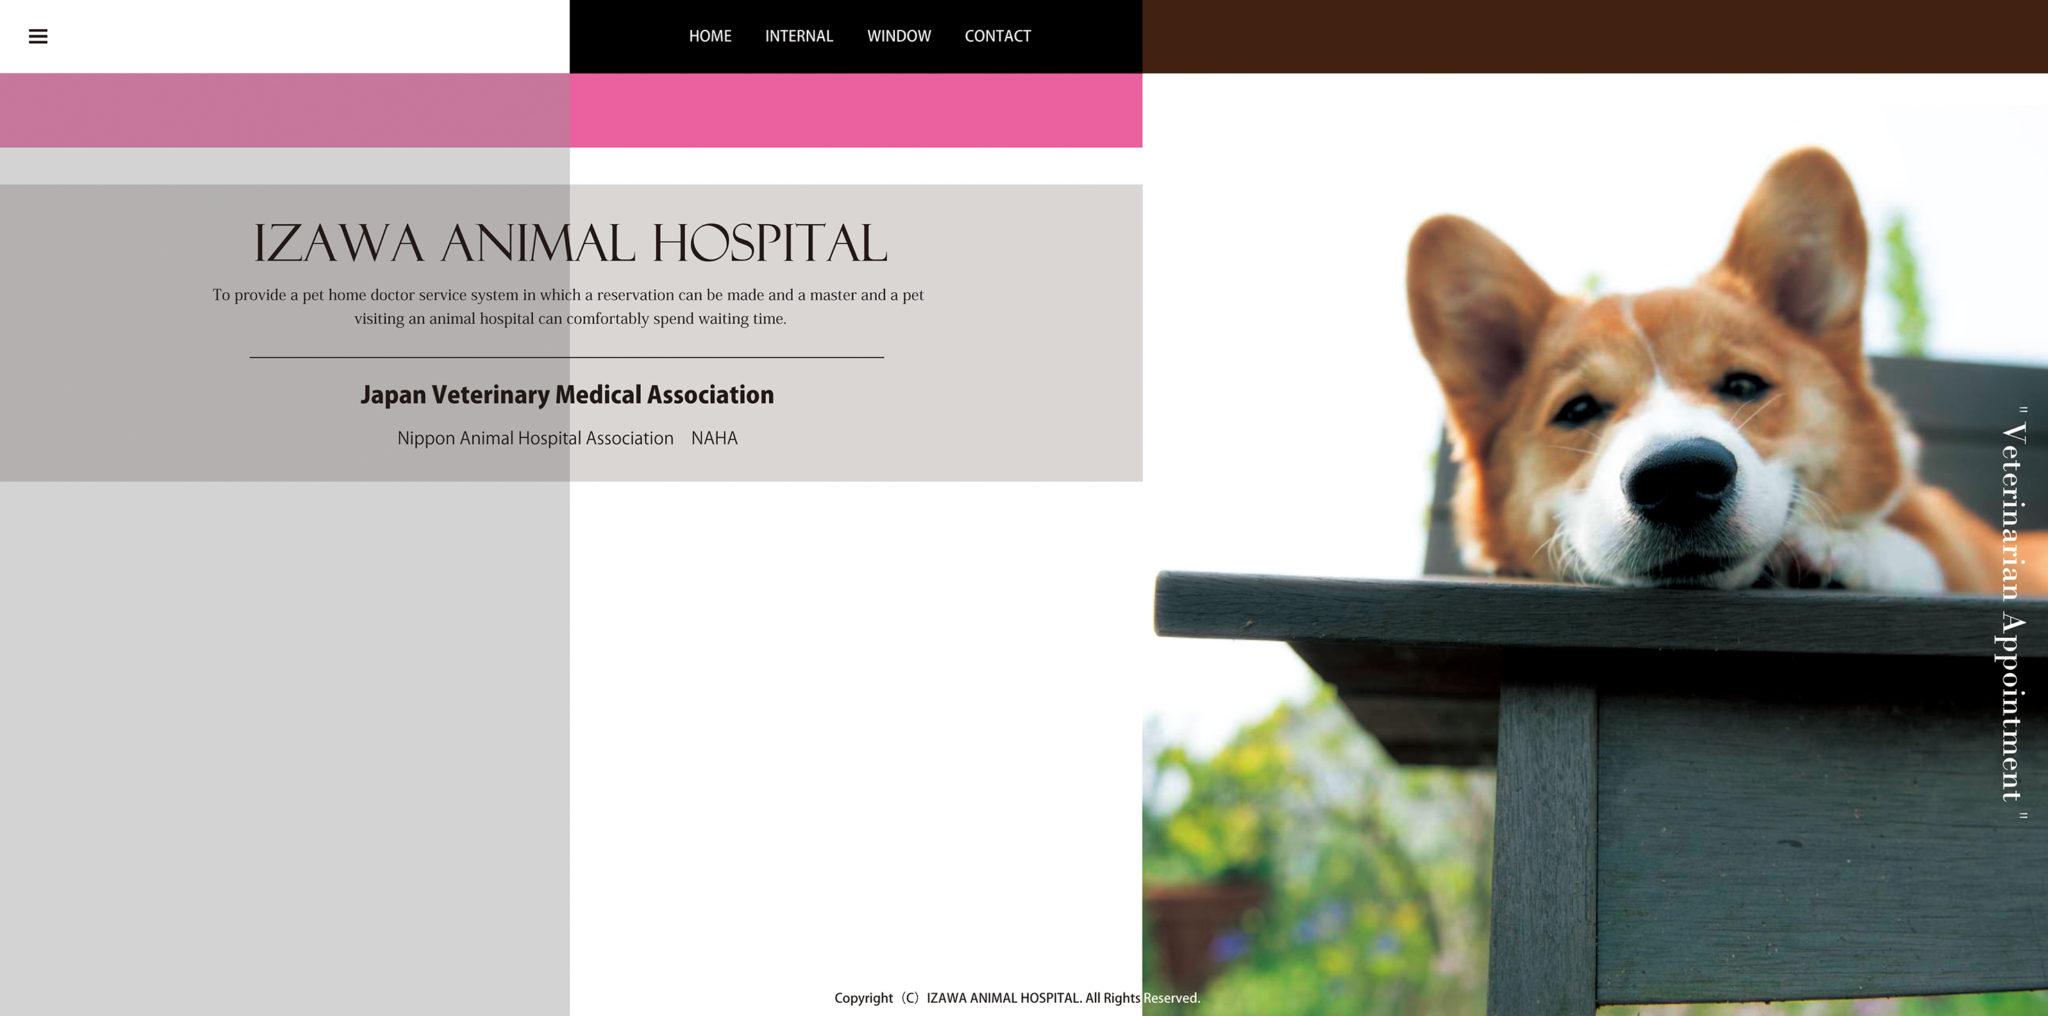 26_IZAWA animal hospital